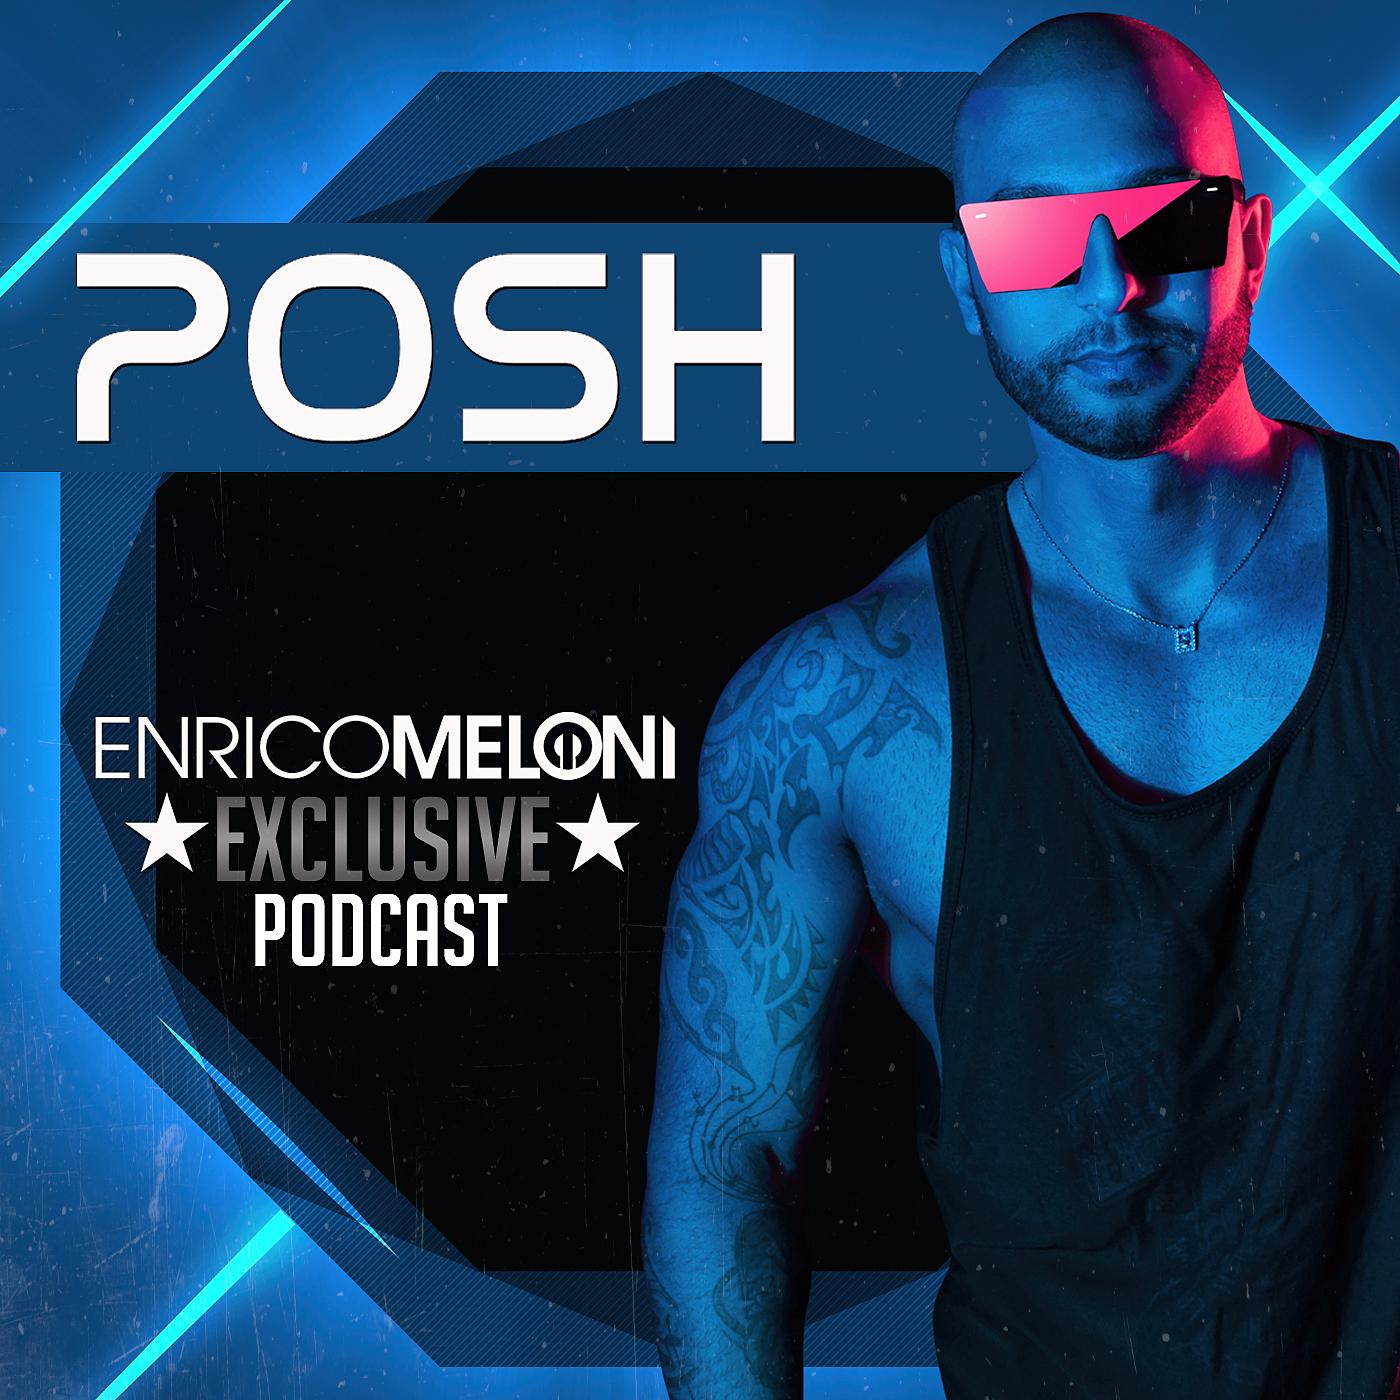 ENRICO MELONI - POSH (Exclusive Promo Set)